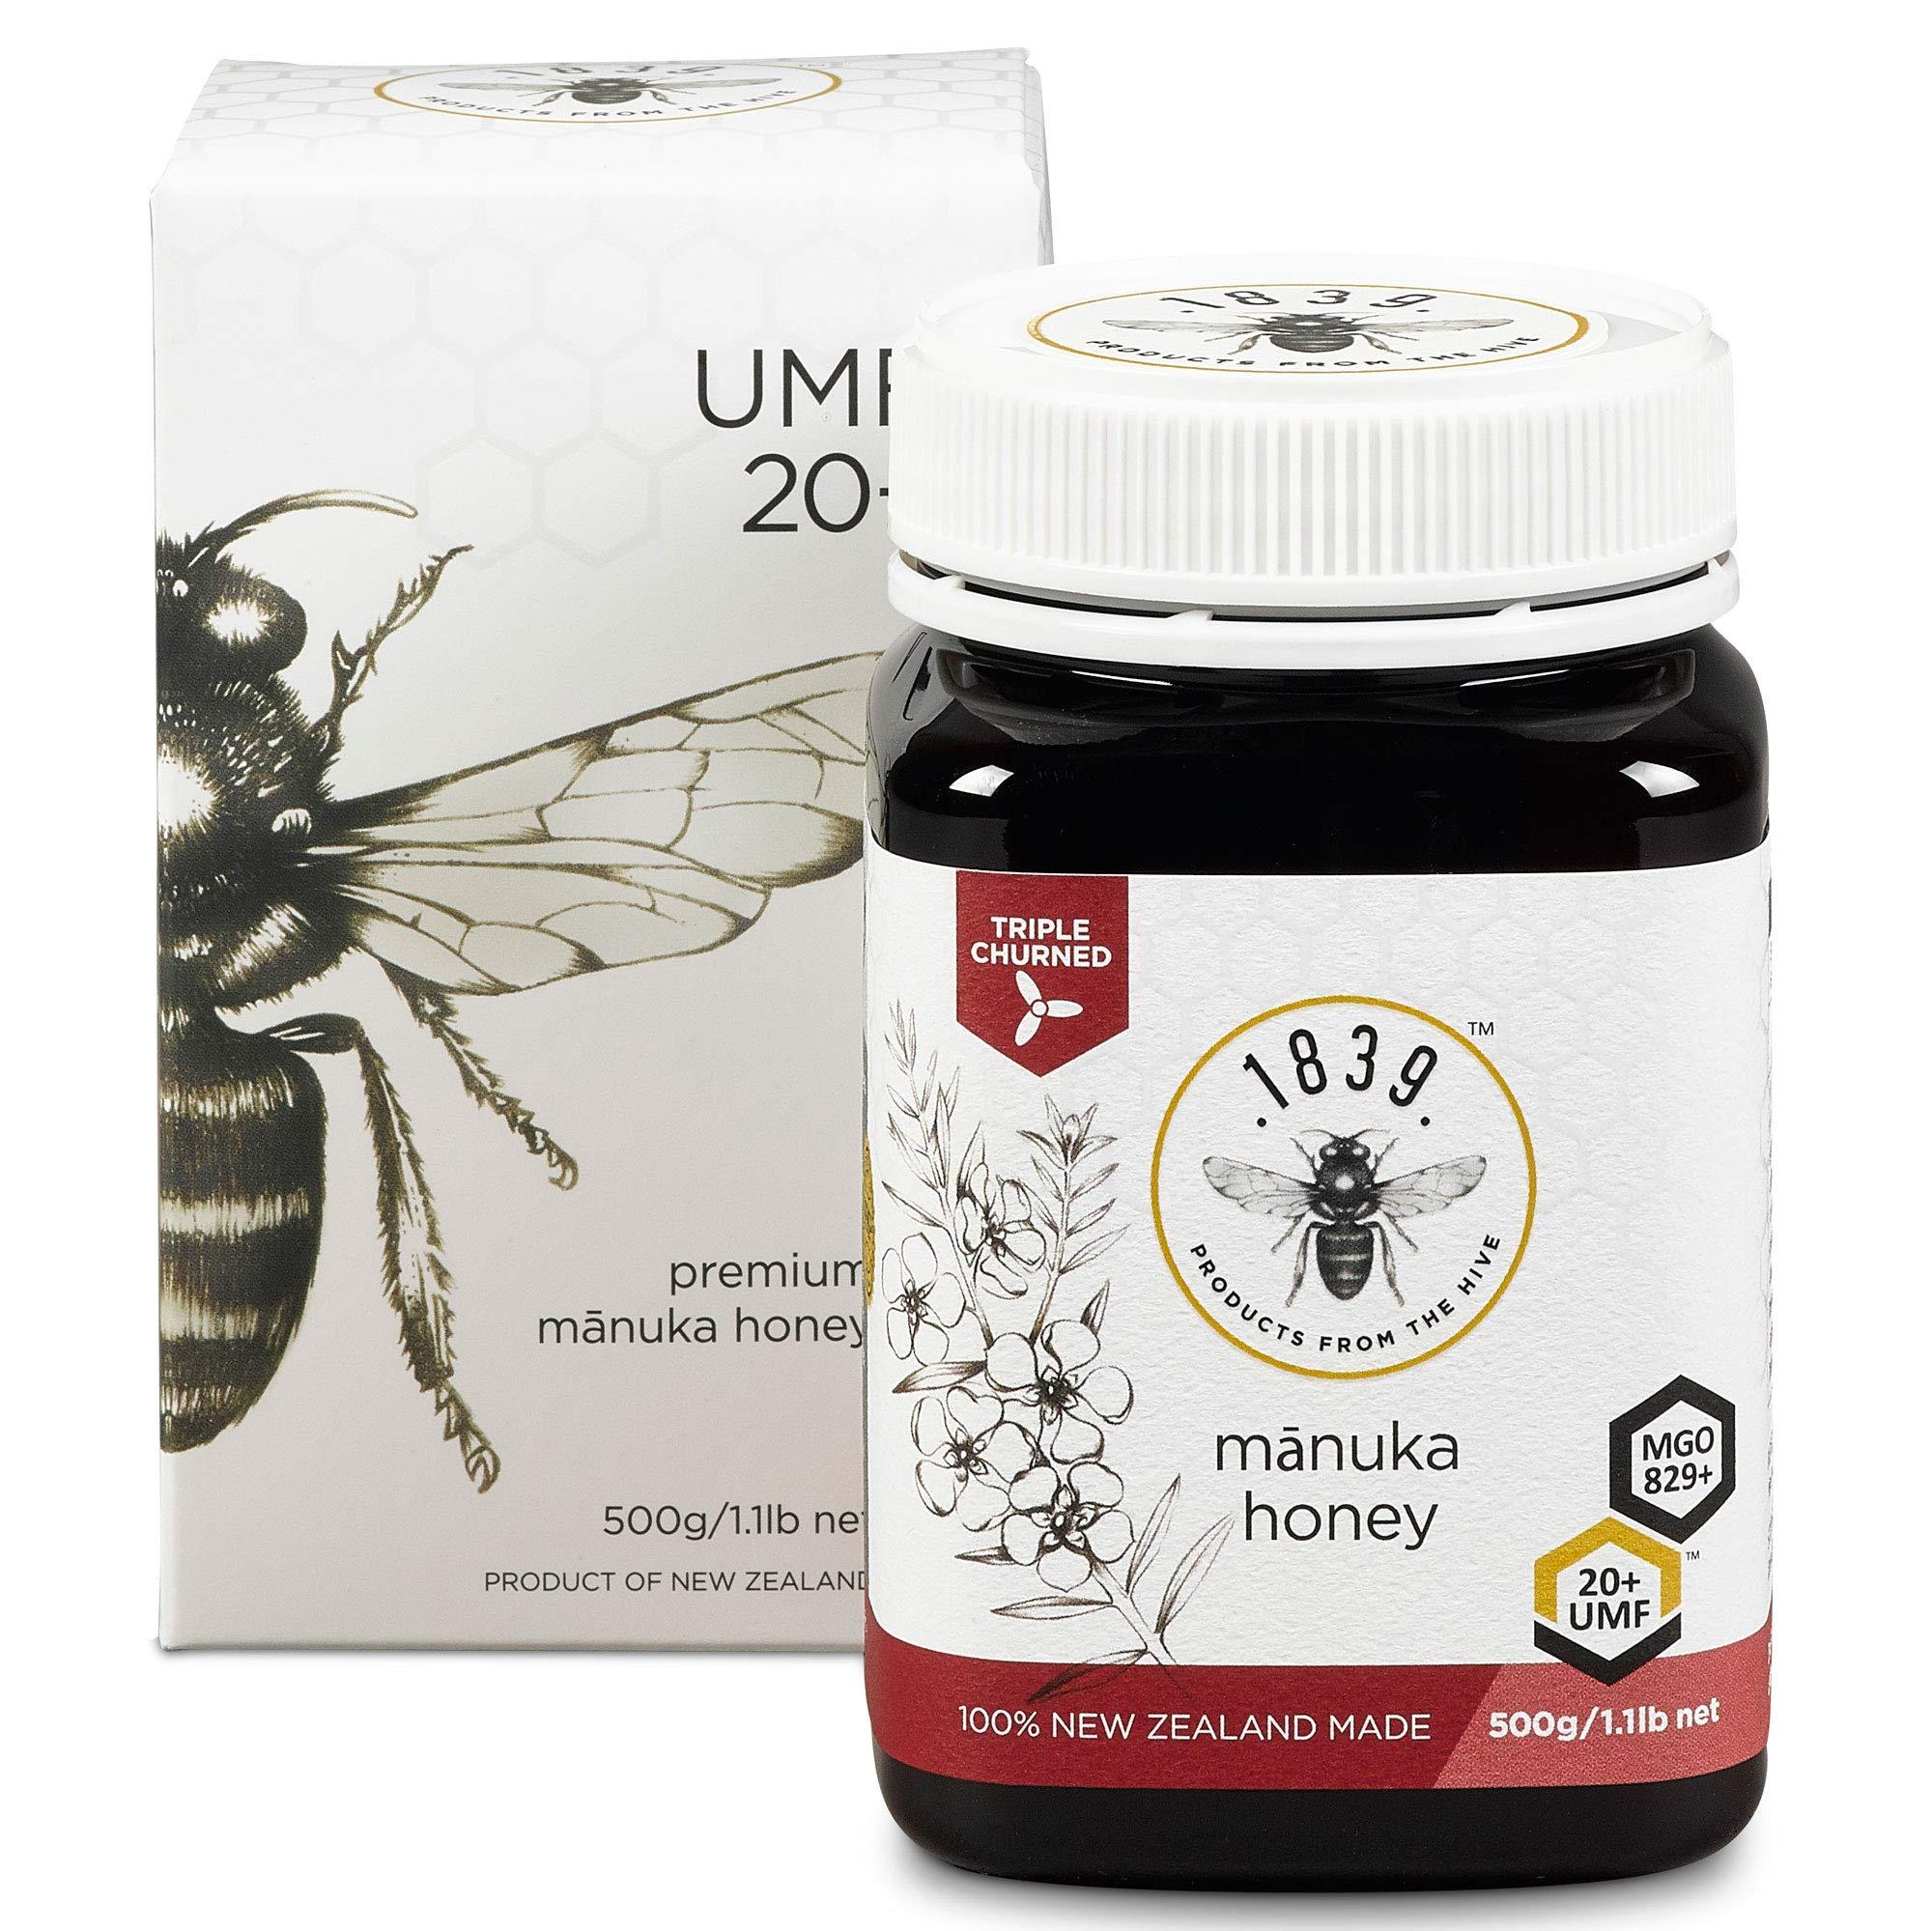 1839 Honey UMF 20+ Premium Manuka Honey (MGO 829+), 500g (1.1lbs)